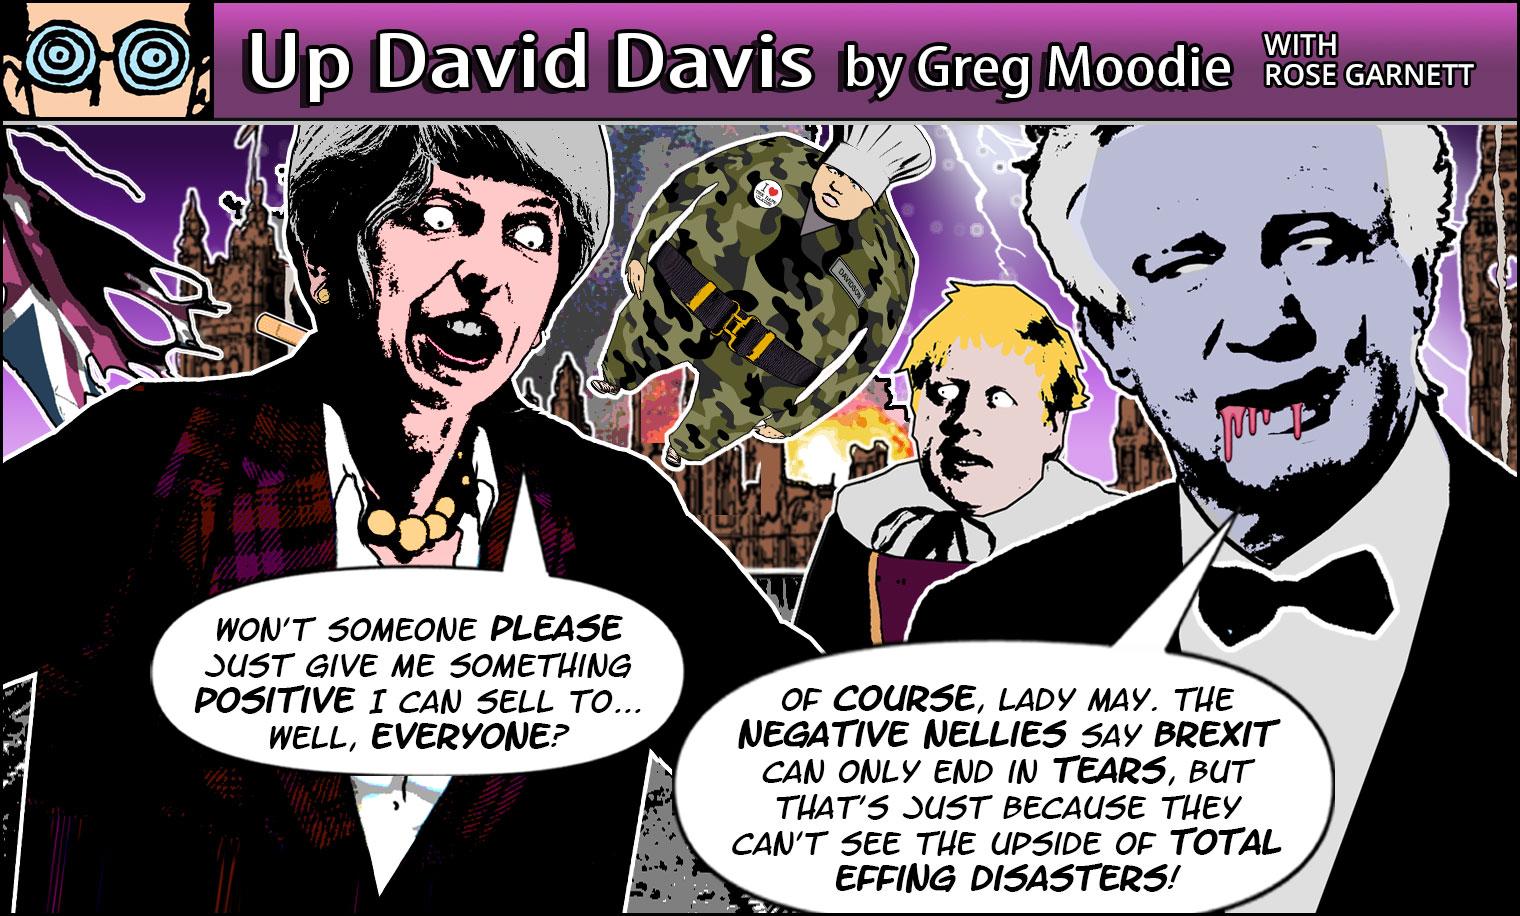 Up David Davis